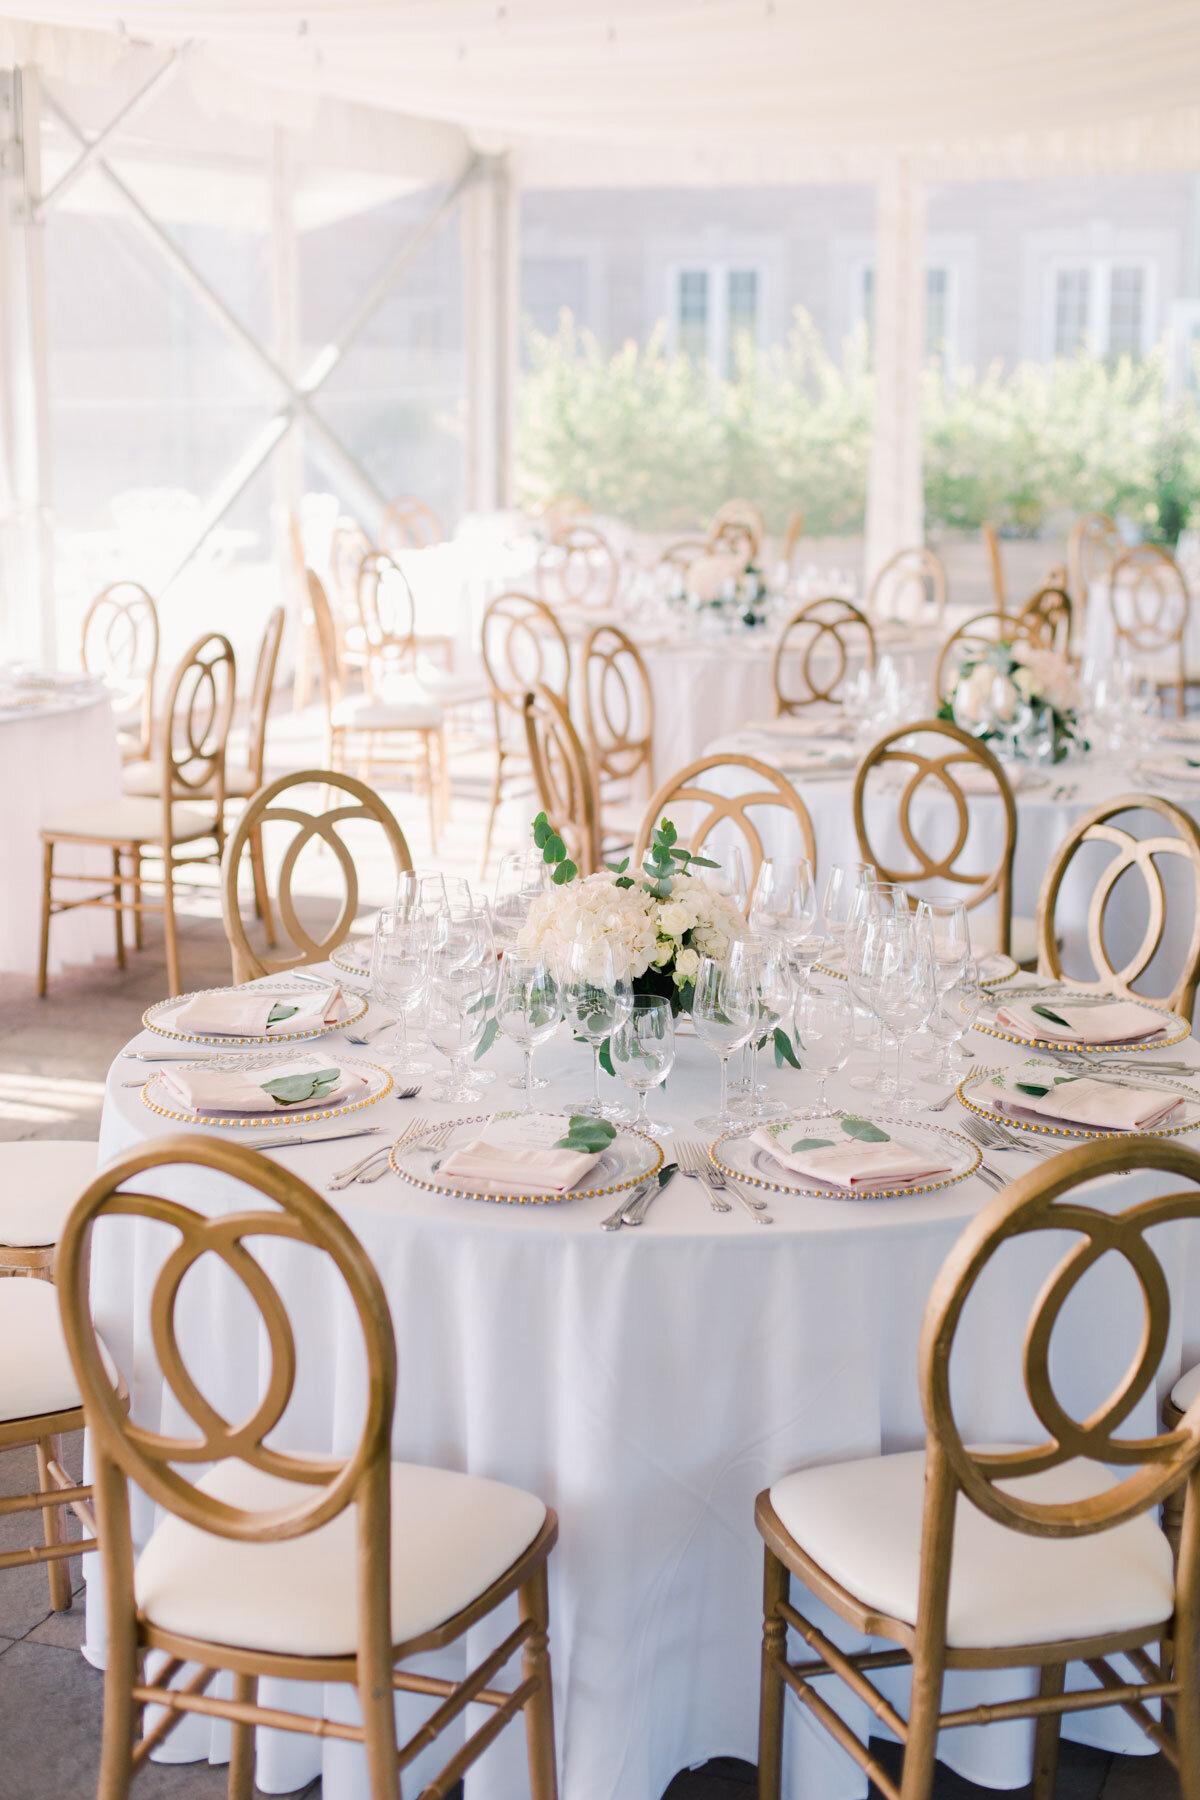 Chateau-des-Charmes-Wedding-Summer-Vineyard-Bride-Niagara-on-the-Lake-photos-by-Gemini-Photography-Ontario-0060.jpg